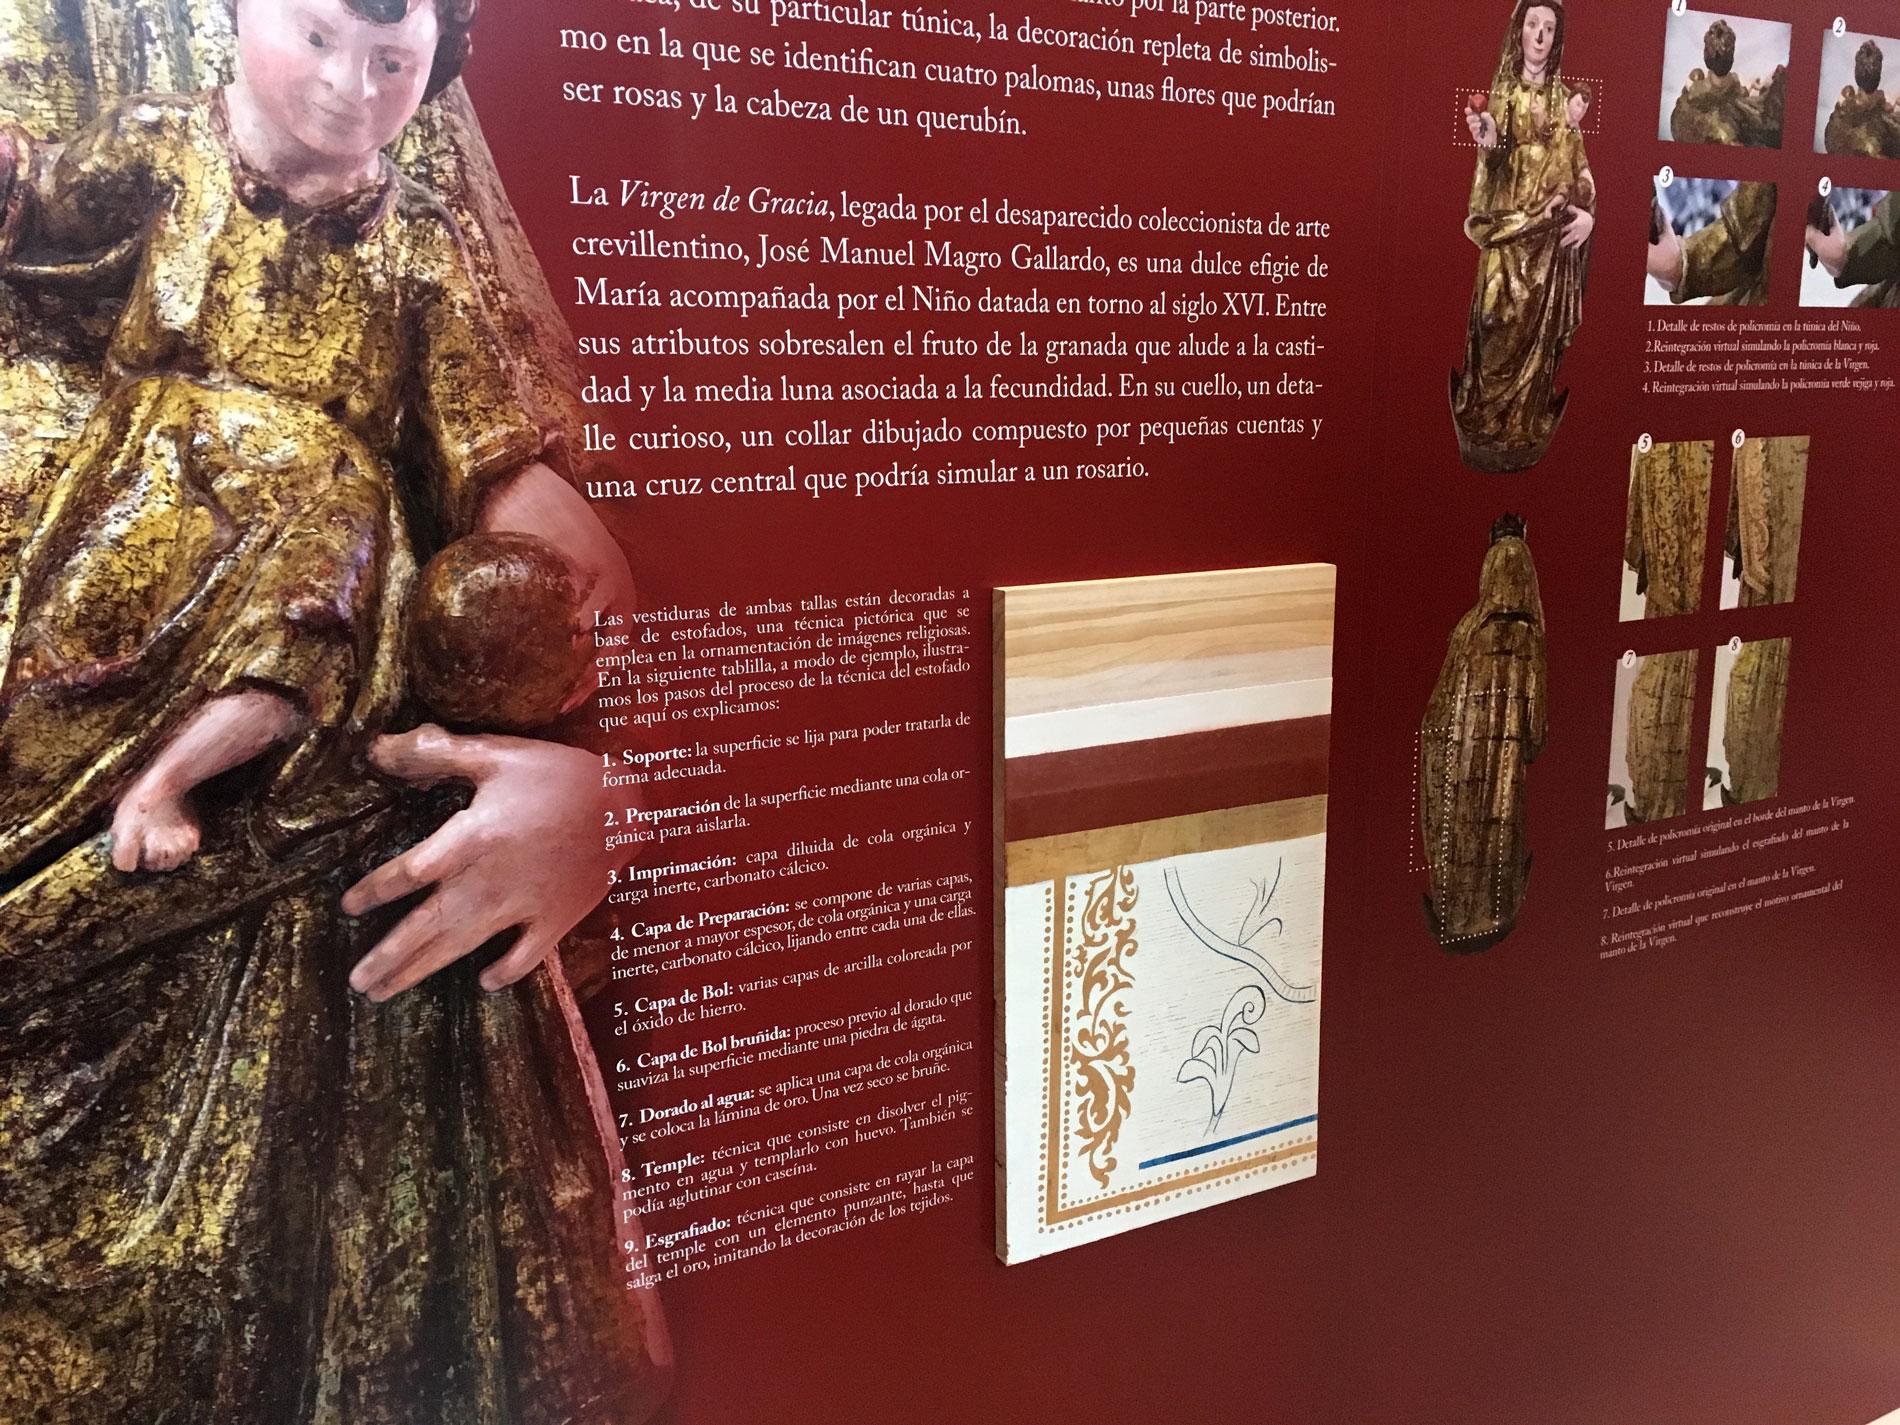 Exposición de Escultura Religiosa en Crevillent